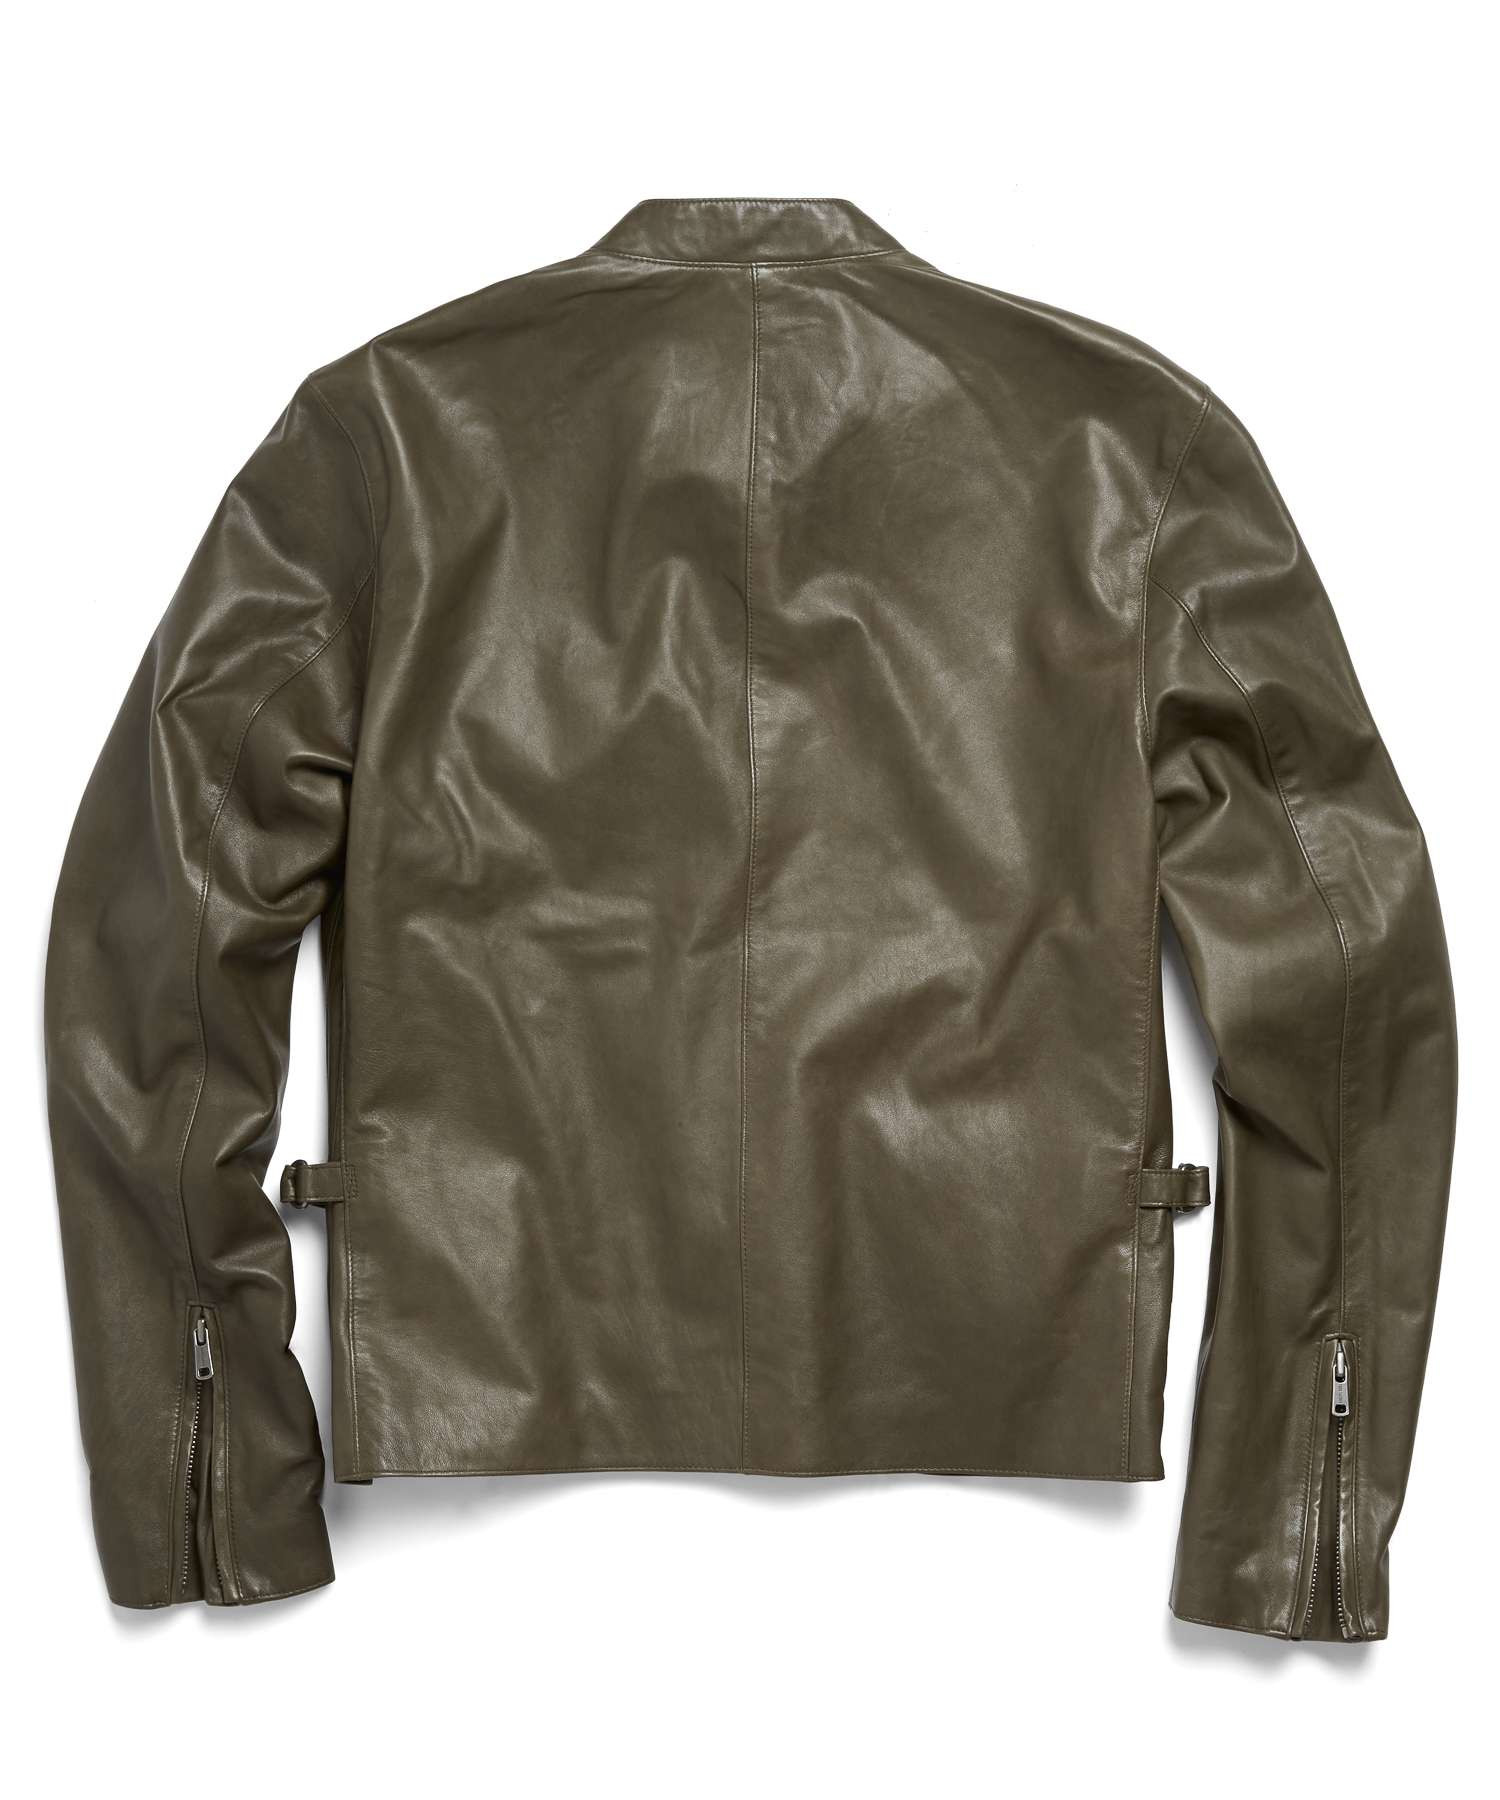 Rag And Bone Leather Jacket Cafe Racer